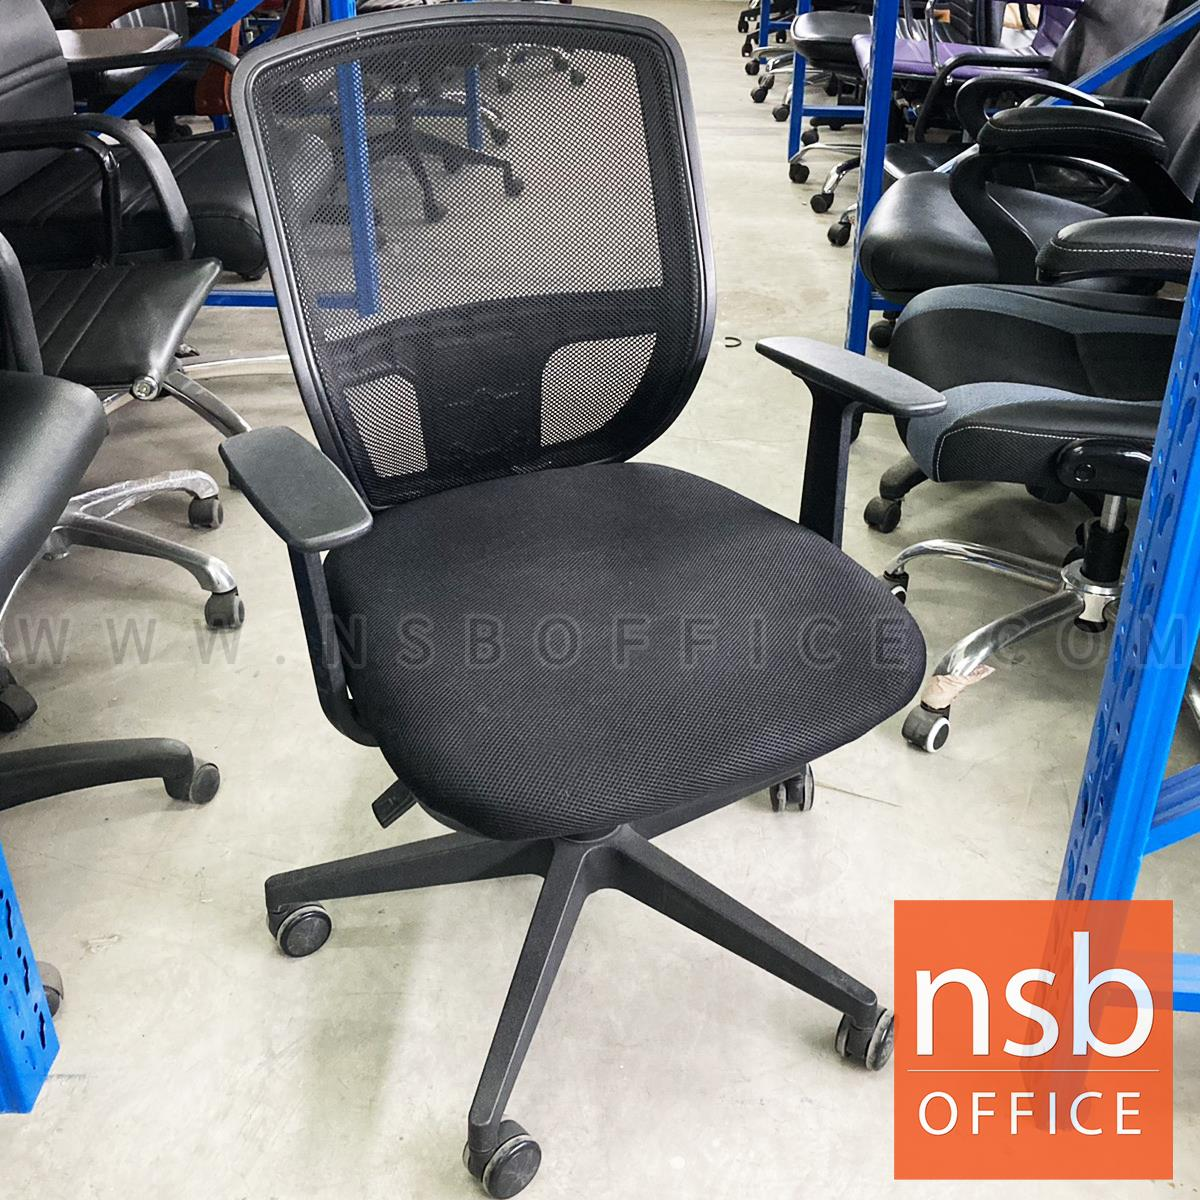 L02A367:เก้าอี้สำนักงานหลังเน็ต   โช๊คแก๊ส มีก้อนโยก ลูกล้อพียู